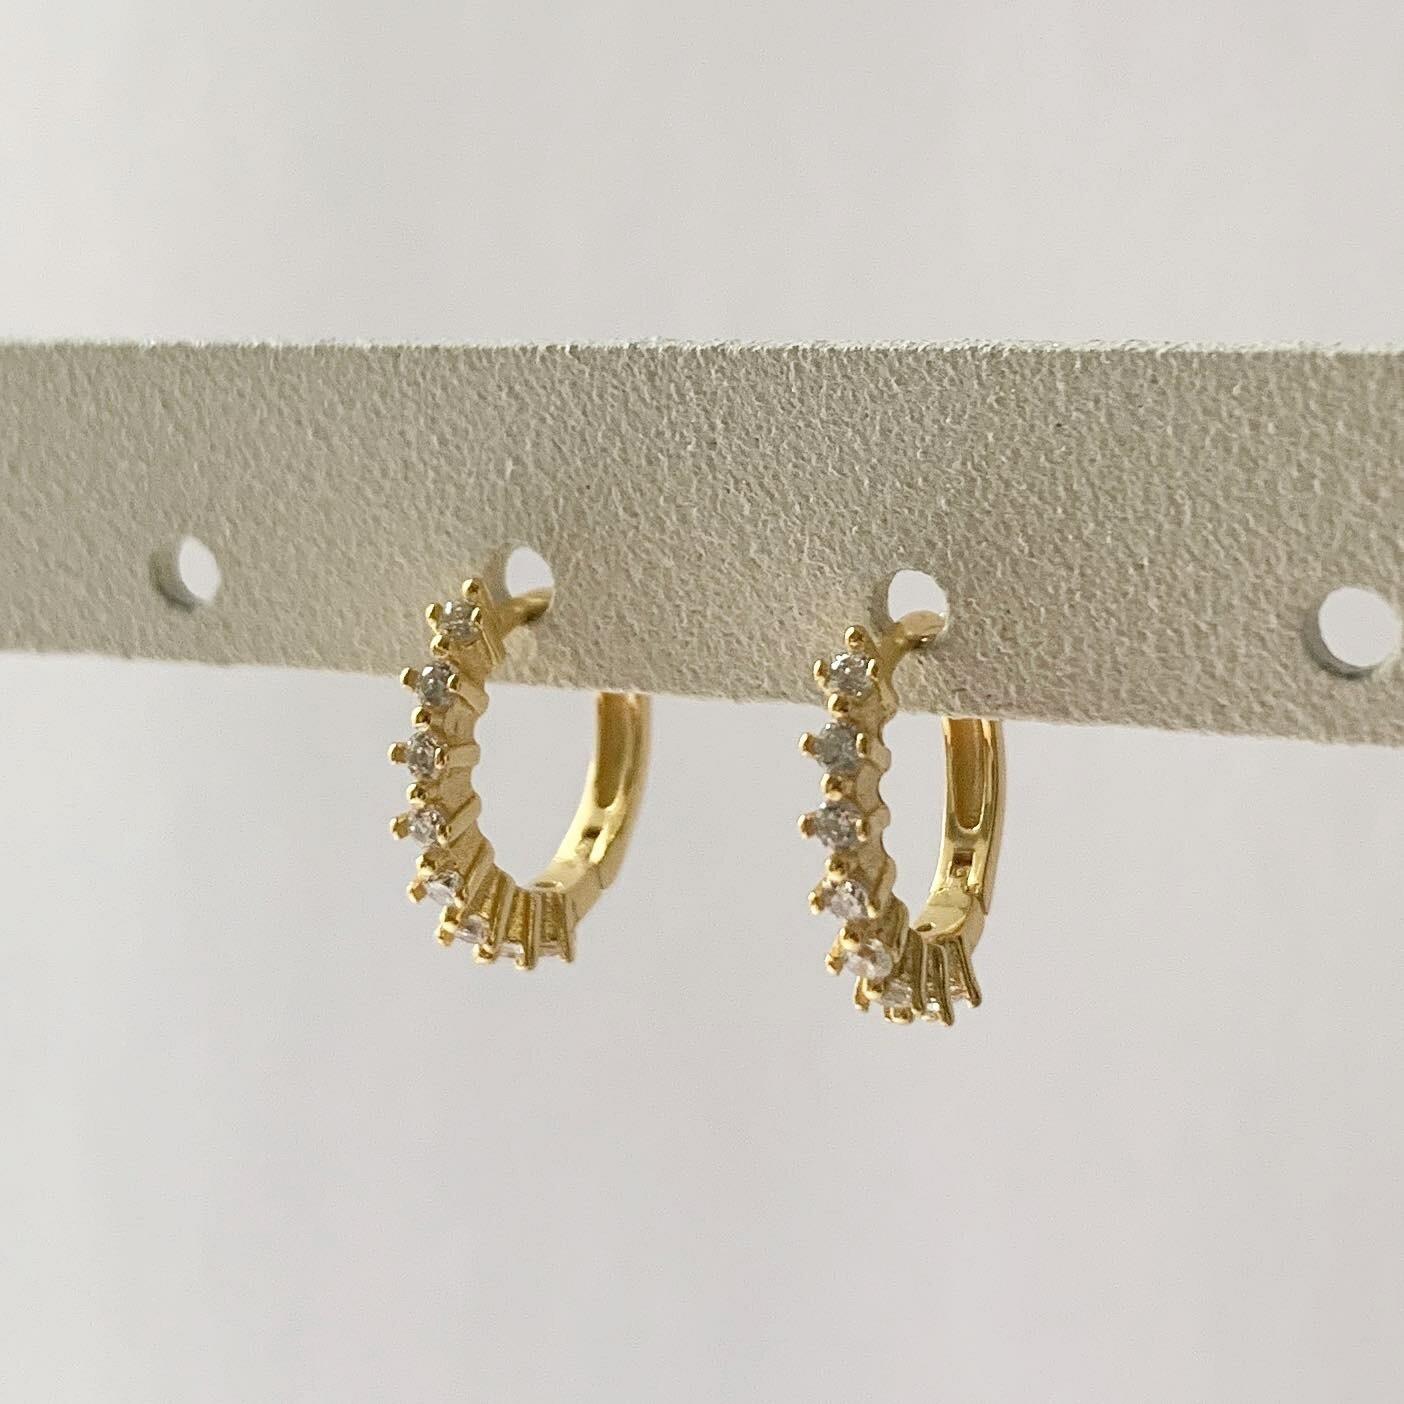 Lovely oorringetjes goud / 925 sterling zilver